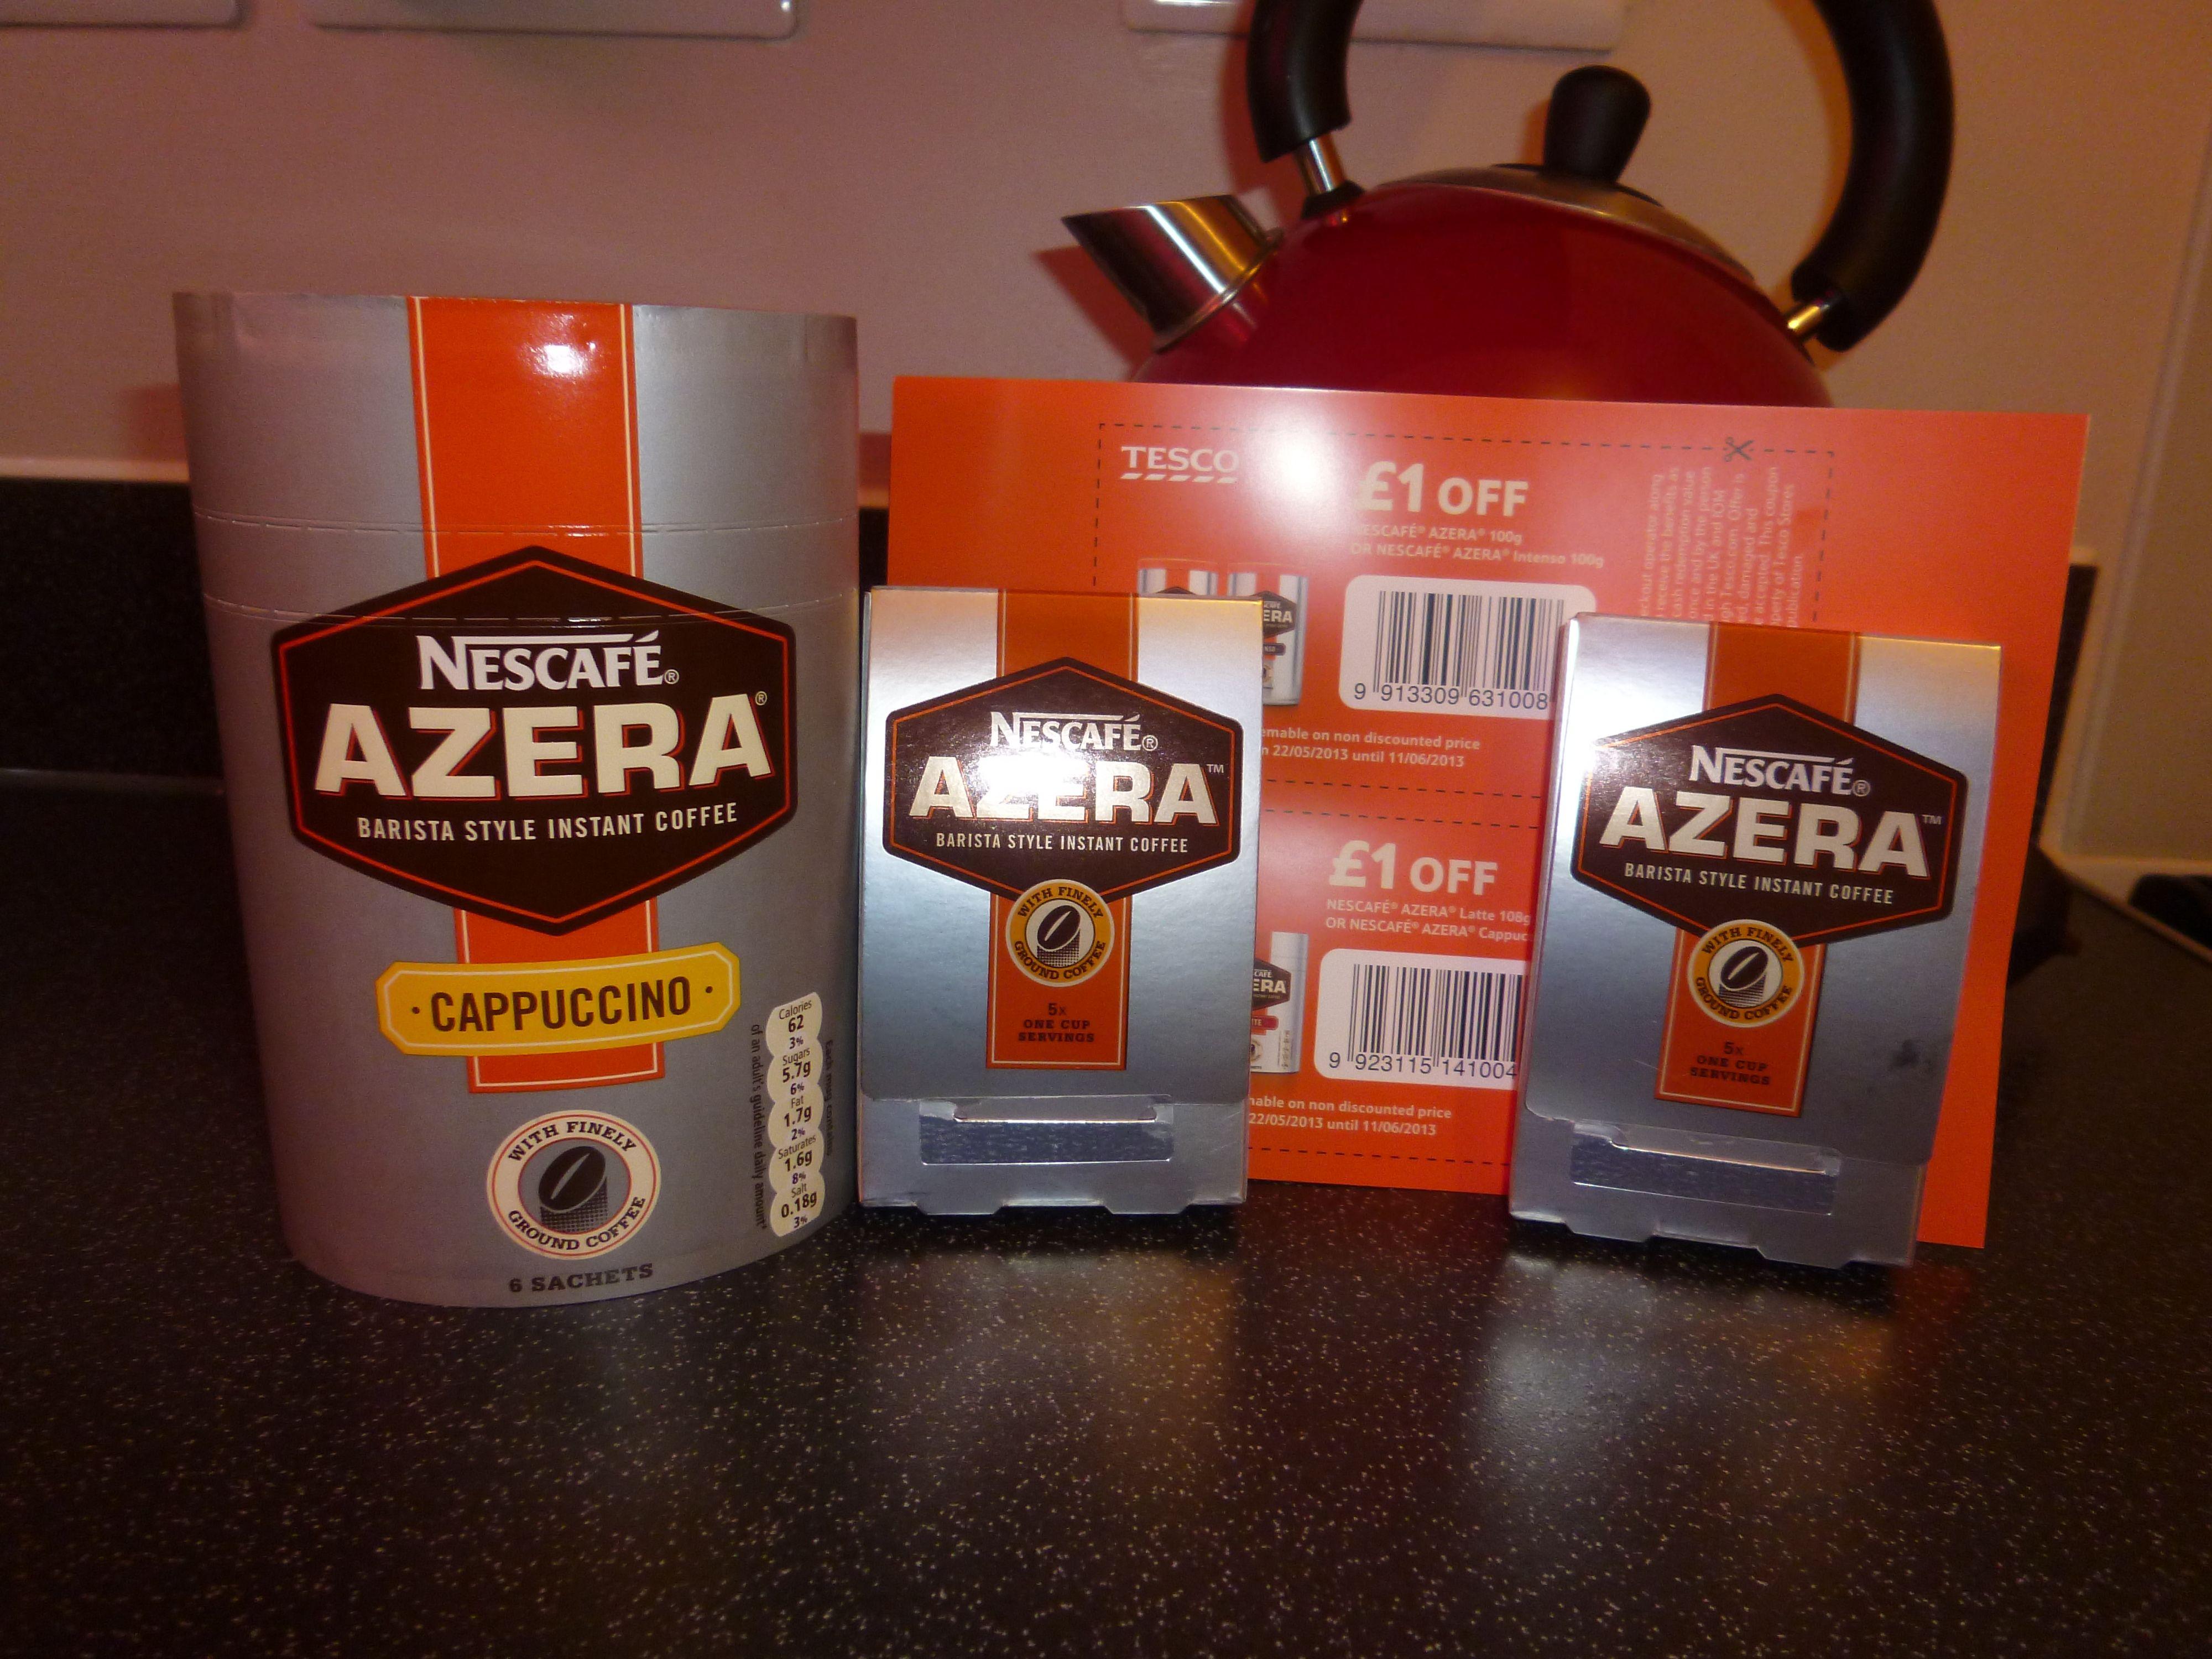 GotItFree I`m a Bzzagent! Nescafe azera, Nescafe